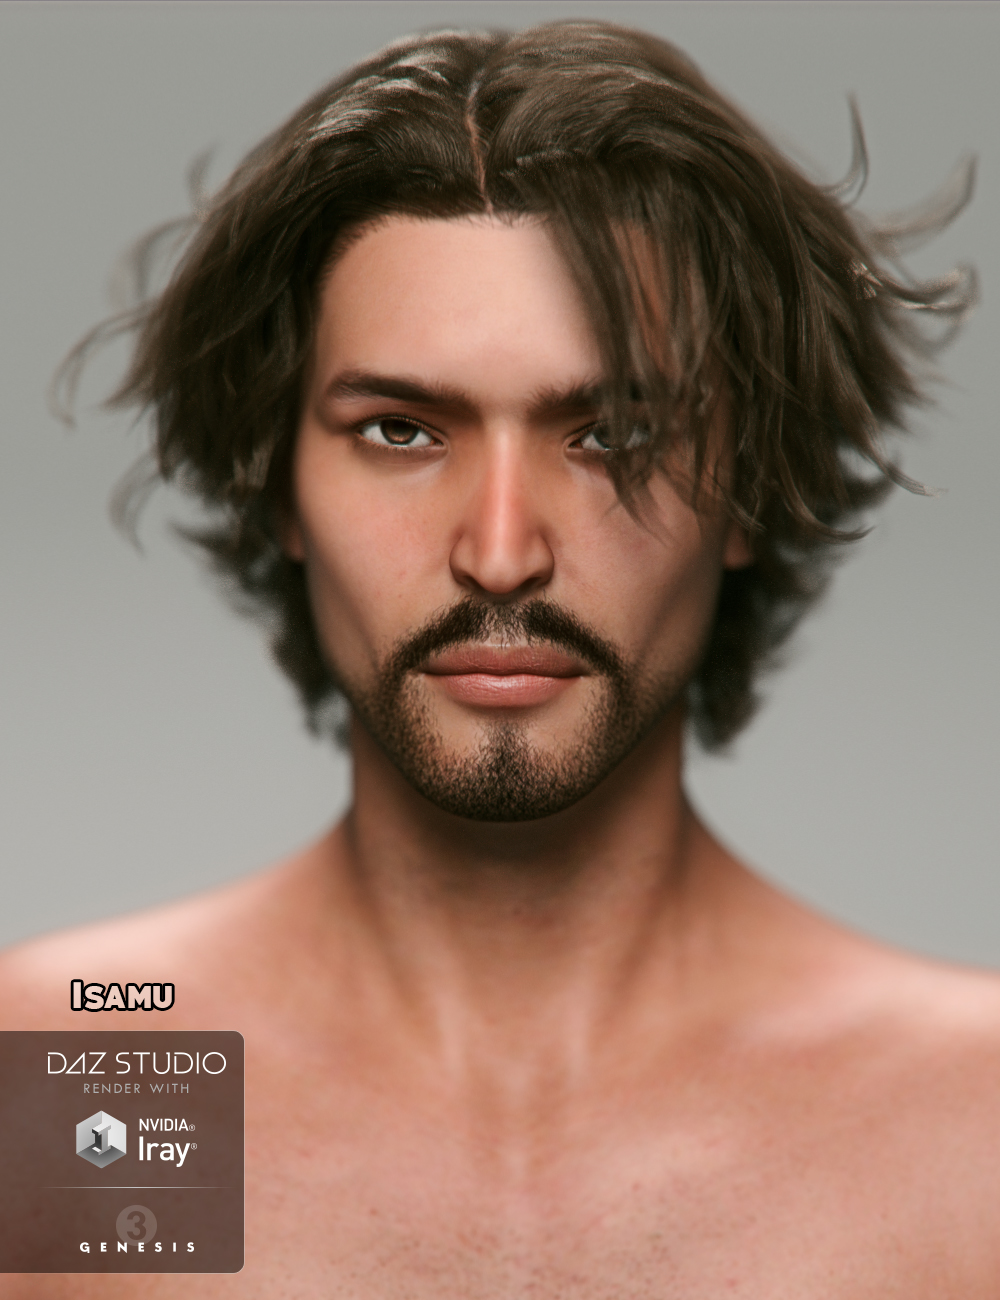 Isamu for Genesis 3 Male by: JavierMicheal, 3D Models by Daz 3D